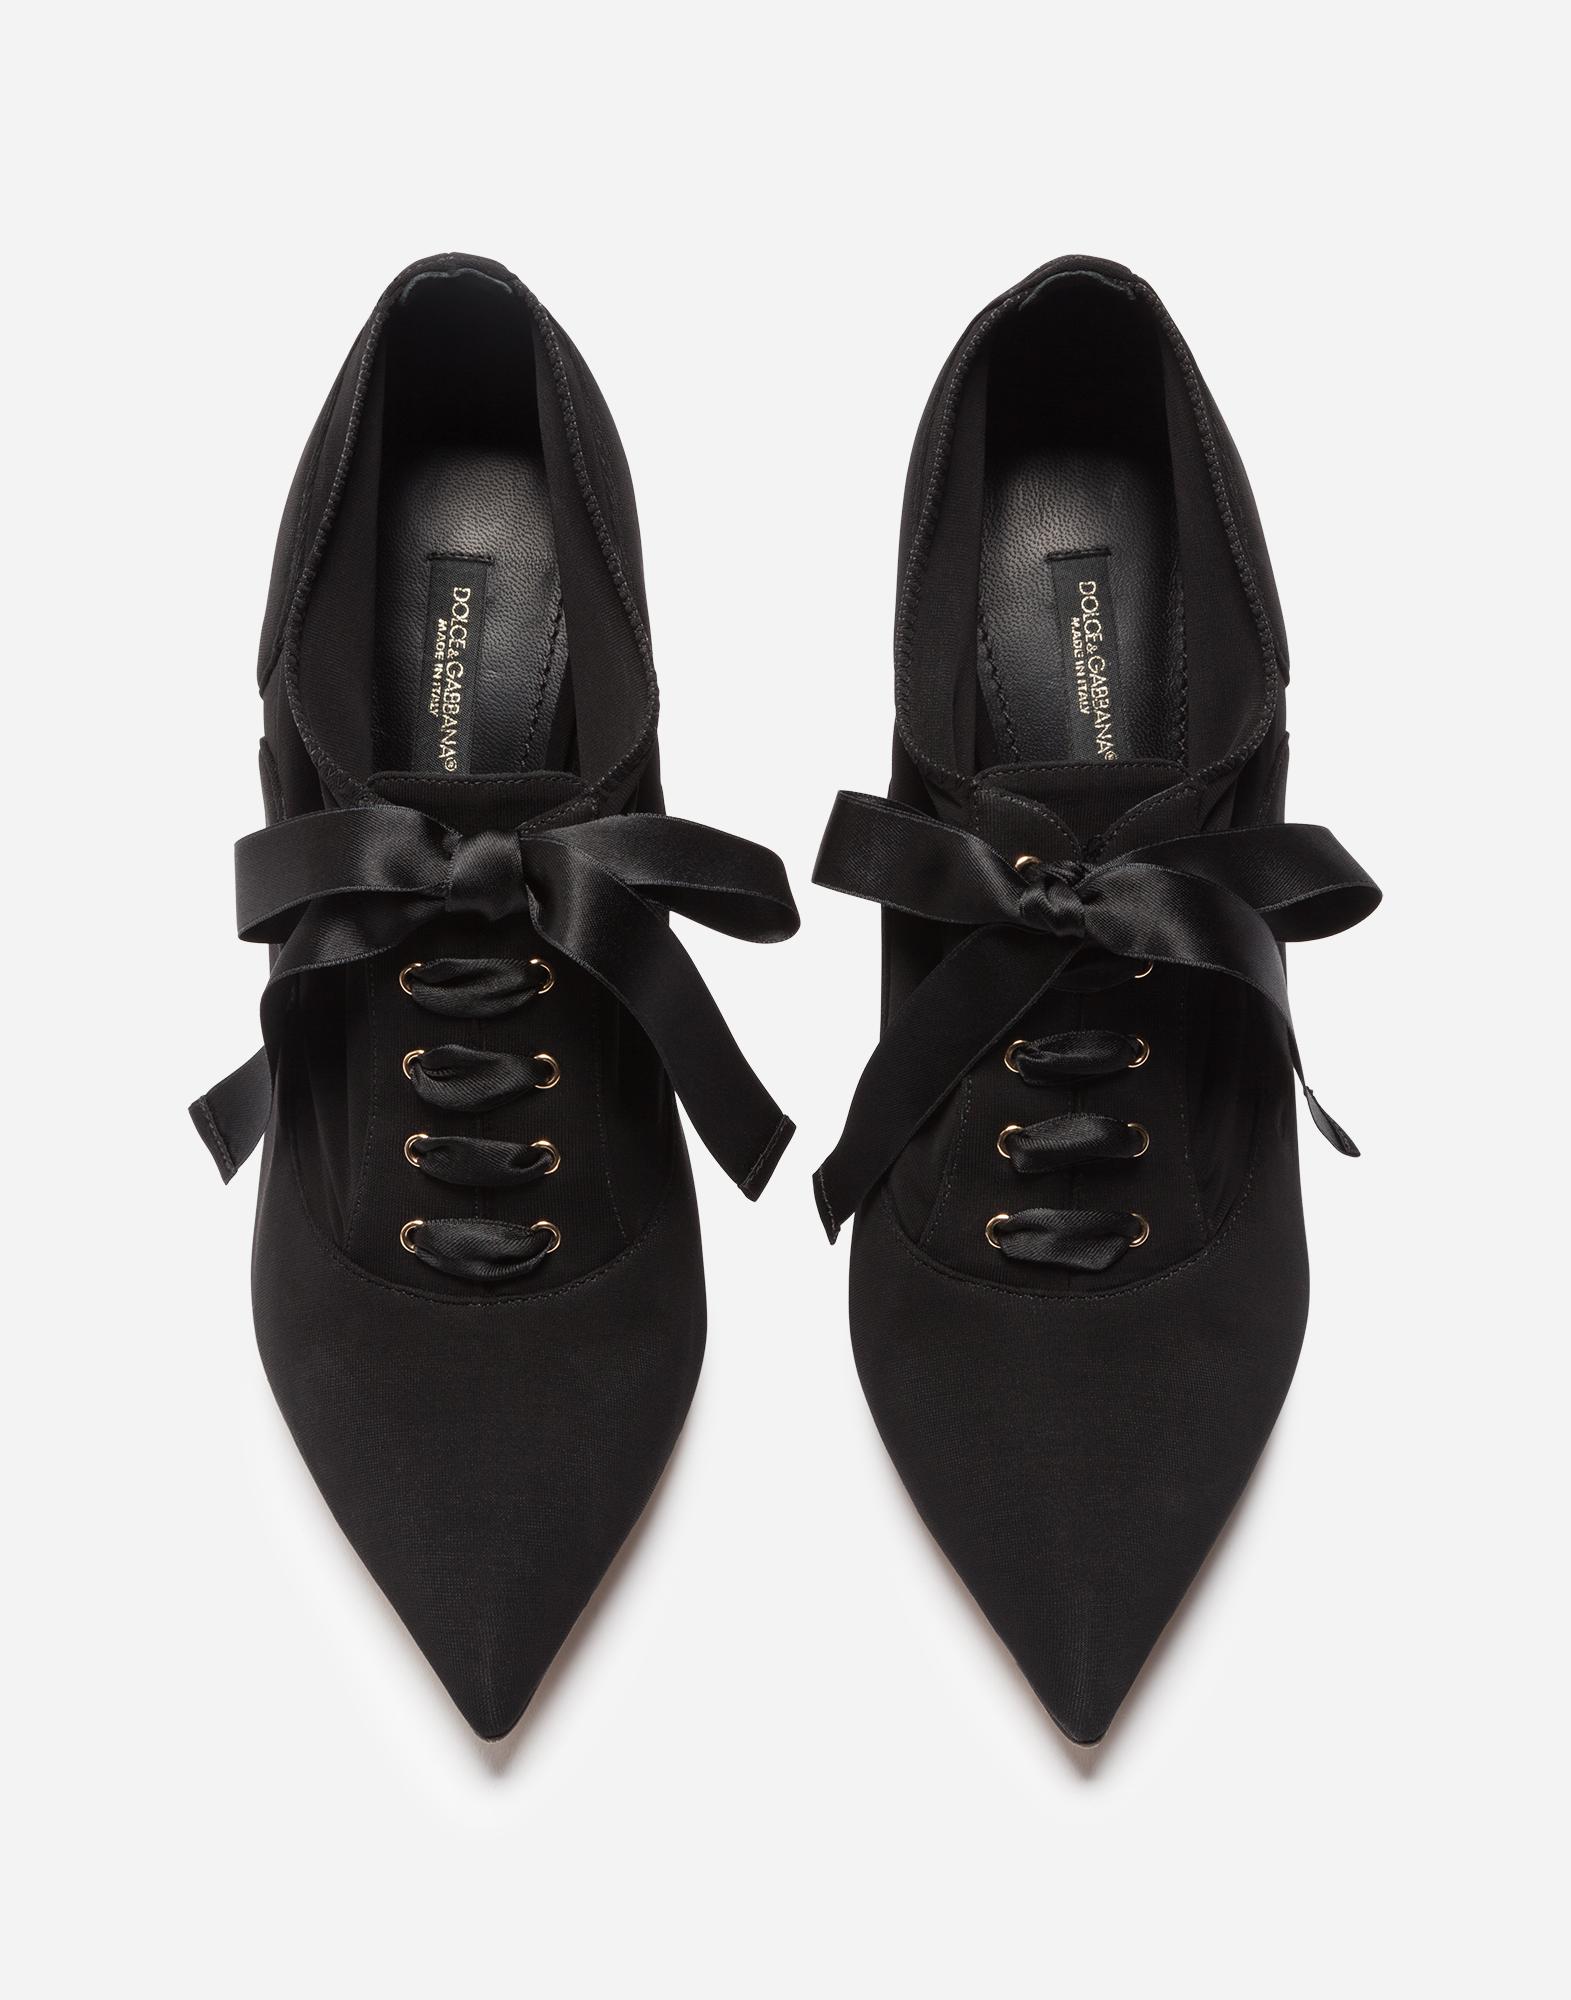 Dolce & Gabbana OXFORDS IN STRETCH JERSEY